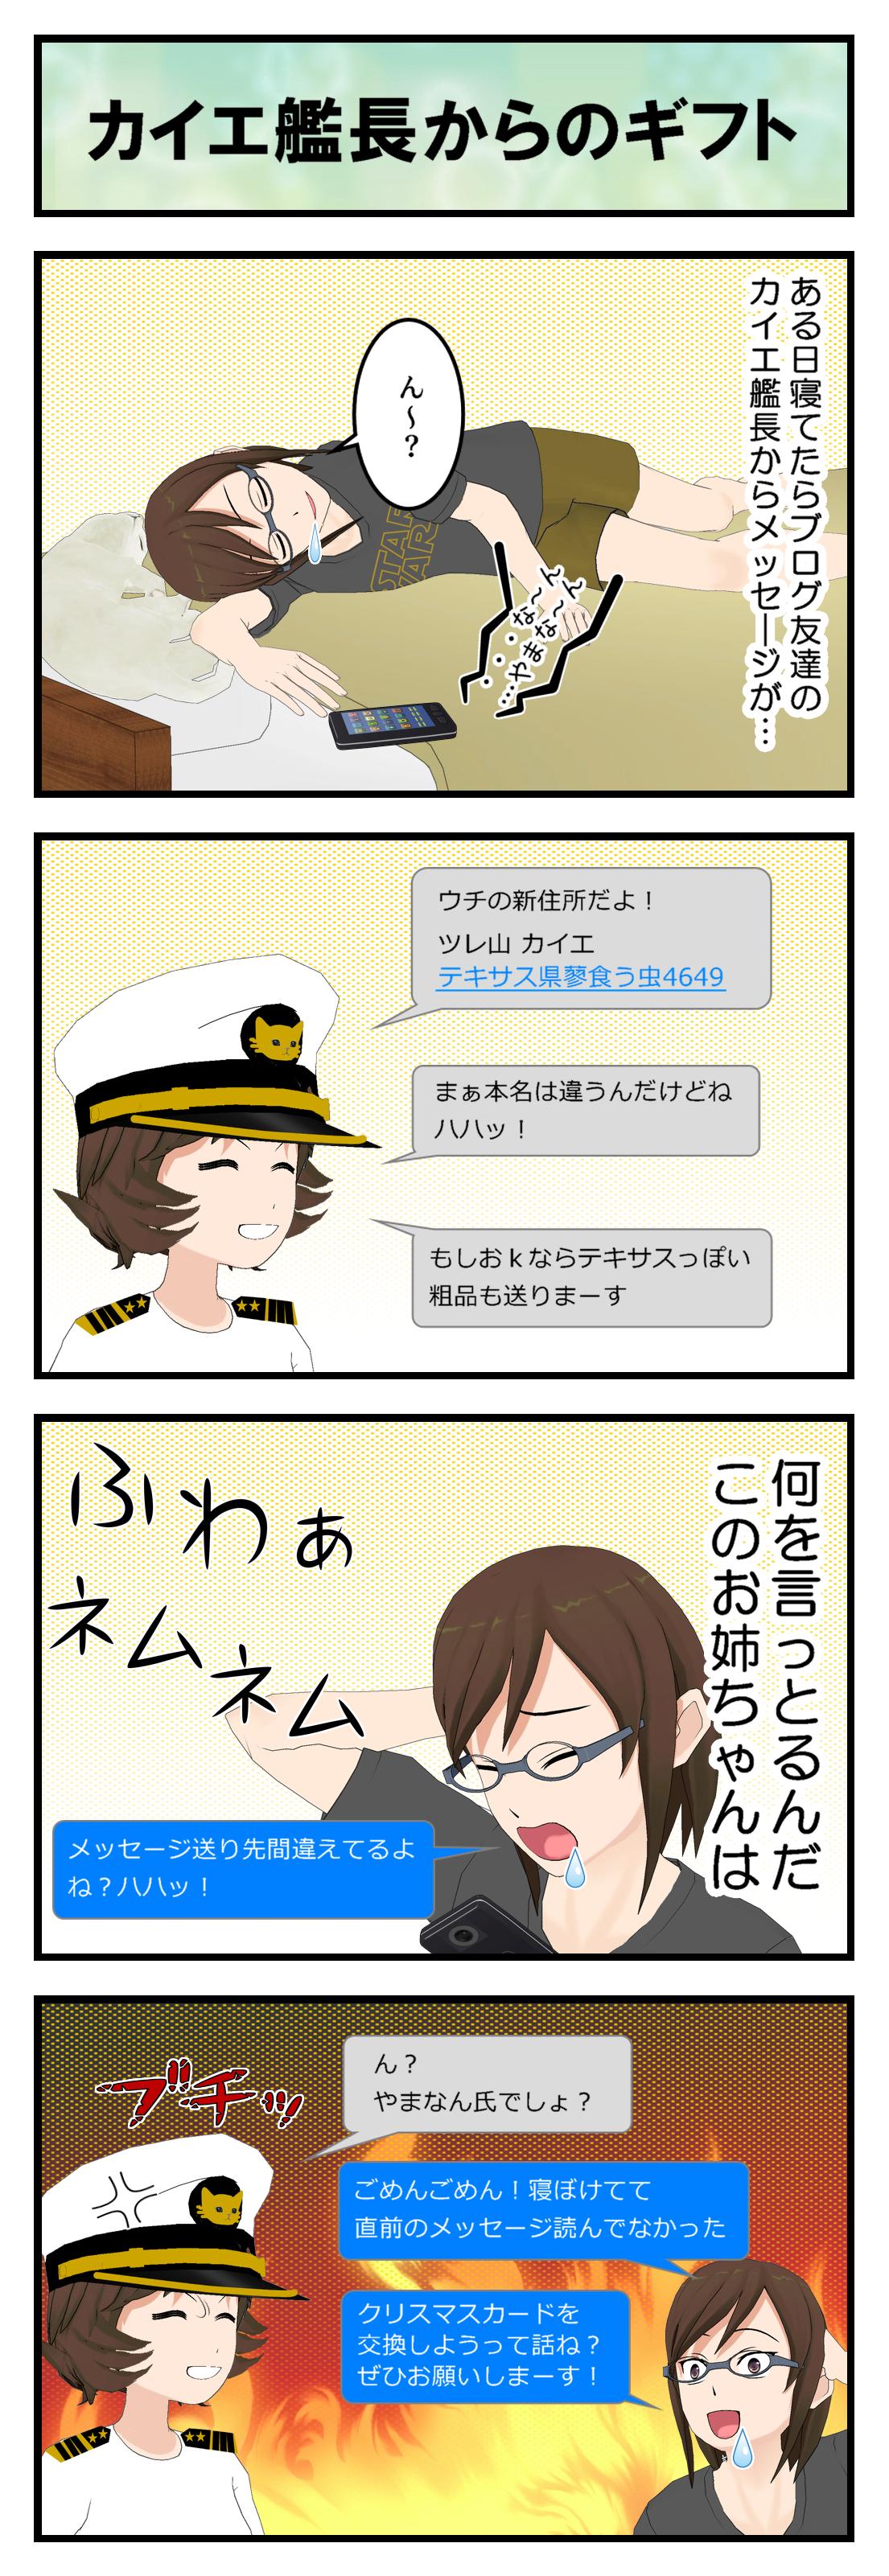 R141_カイエ艦長からのギフト_001